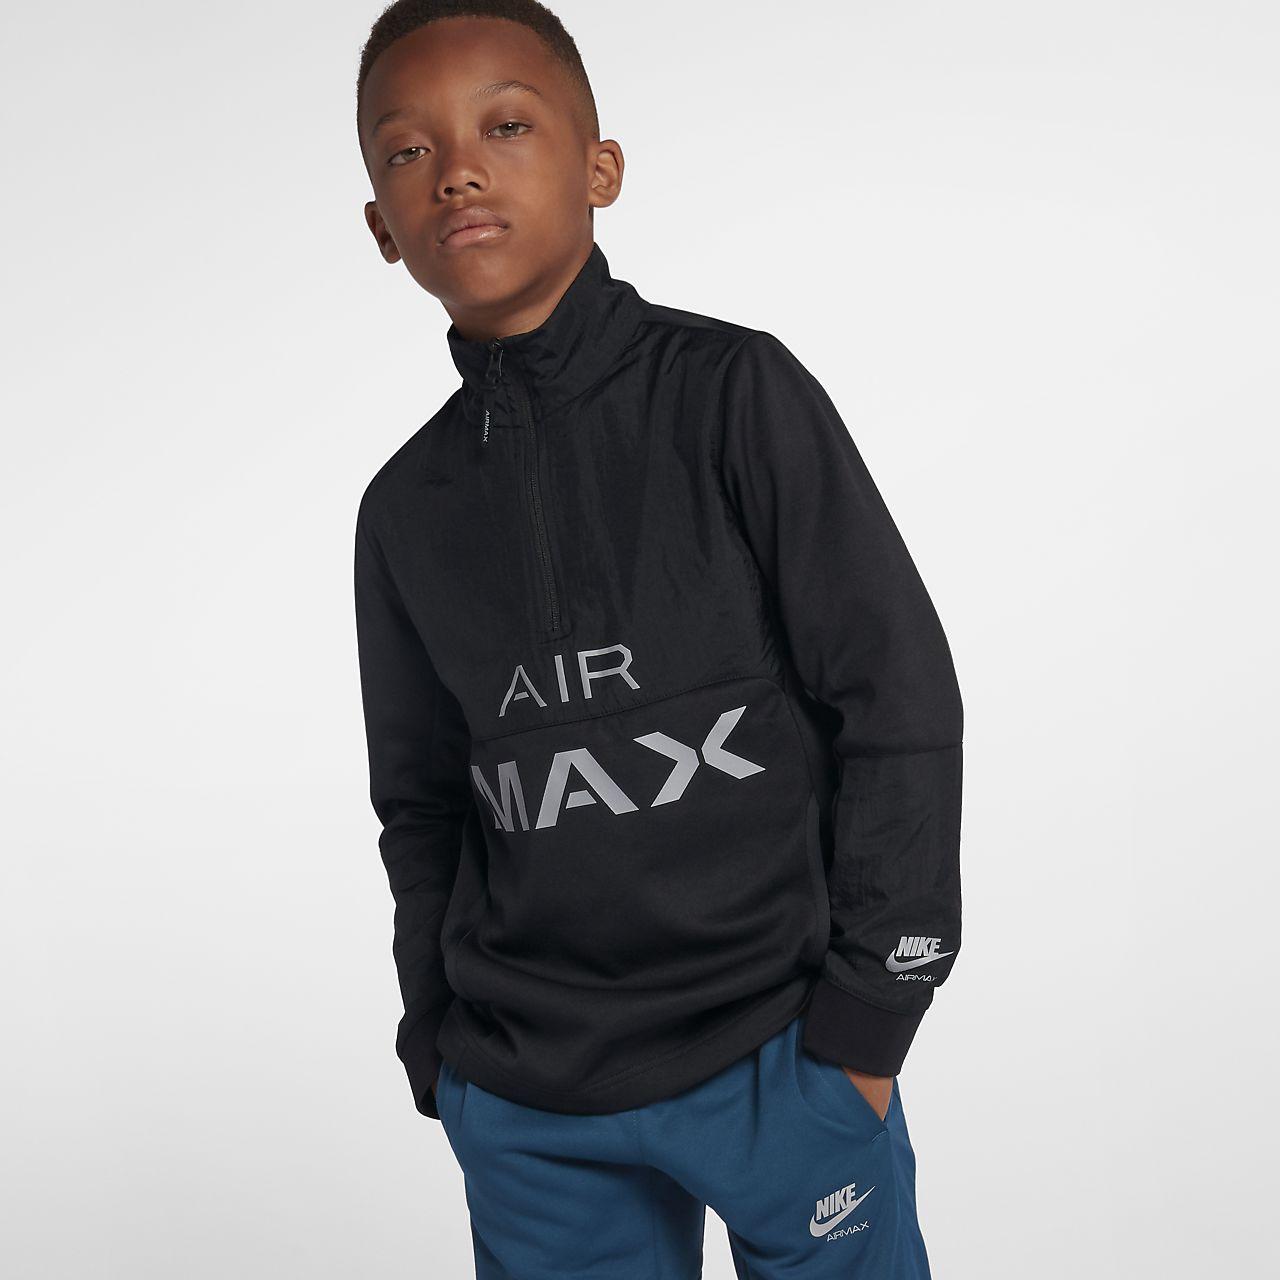 3319638624c4 Nike Air Max Older Kids  (Boys ) Track Jacket. Nike.com GB